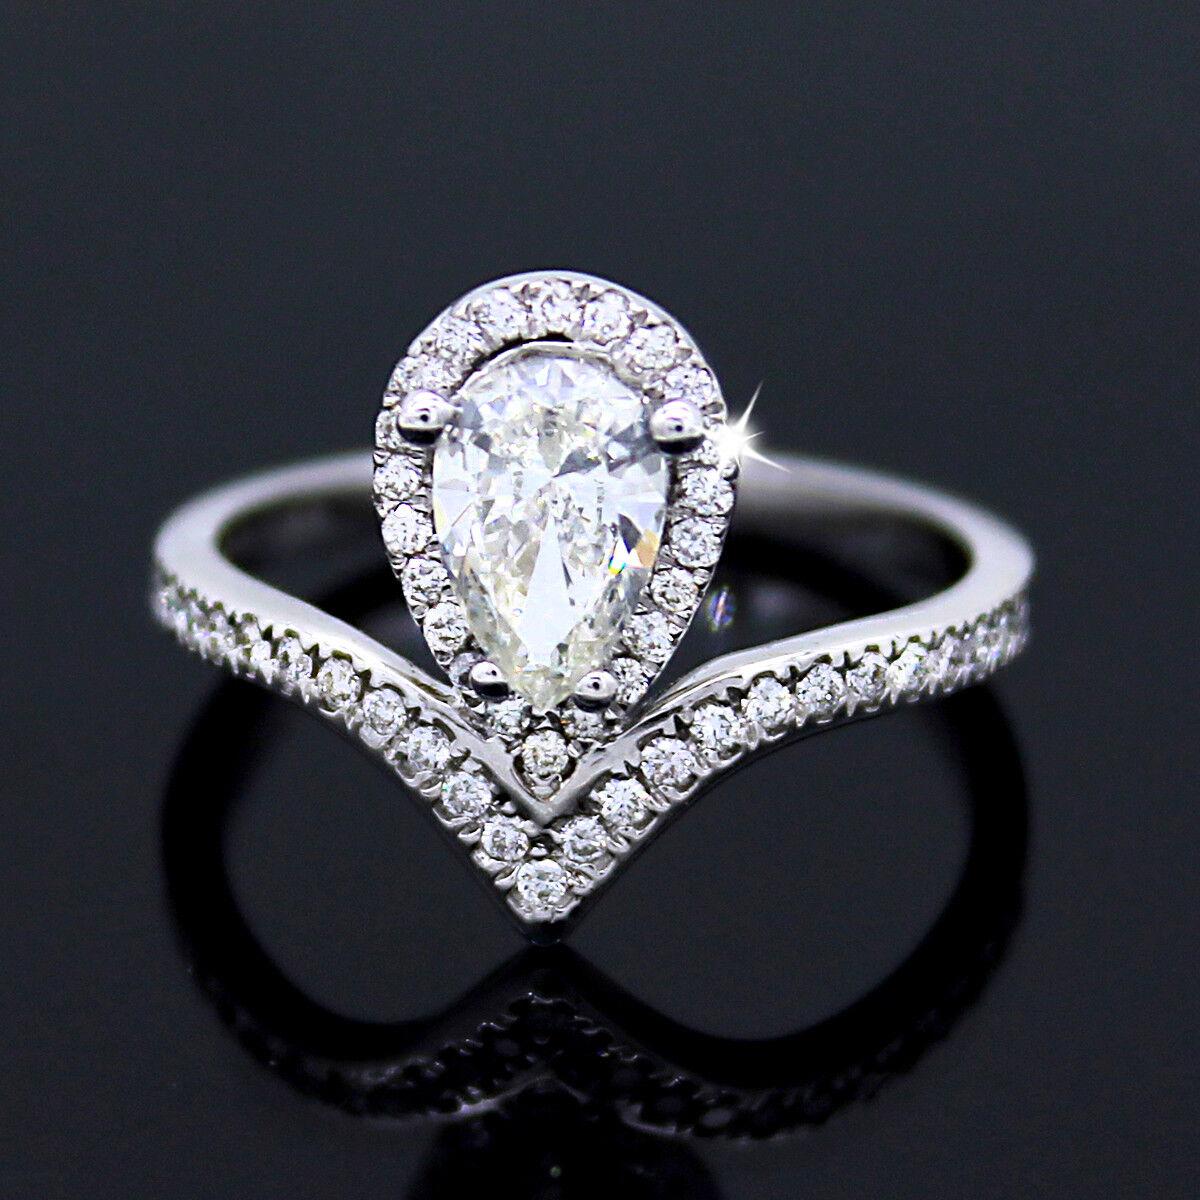 Pear Cut Diamond Modern Engagement Ring GIA Certified 14kt White Gold VS2 H-I